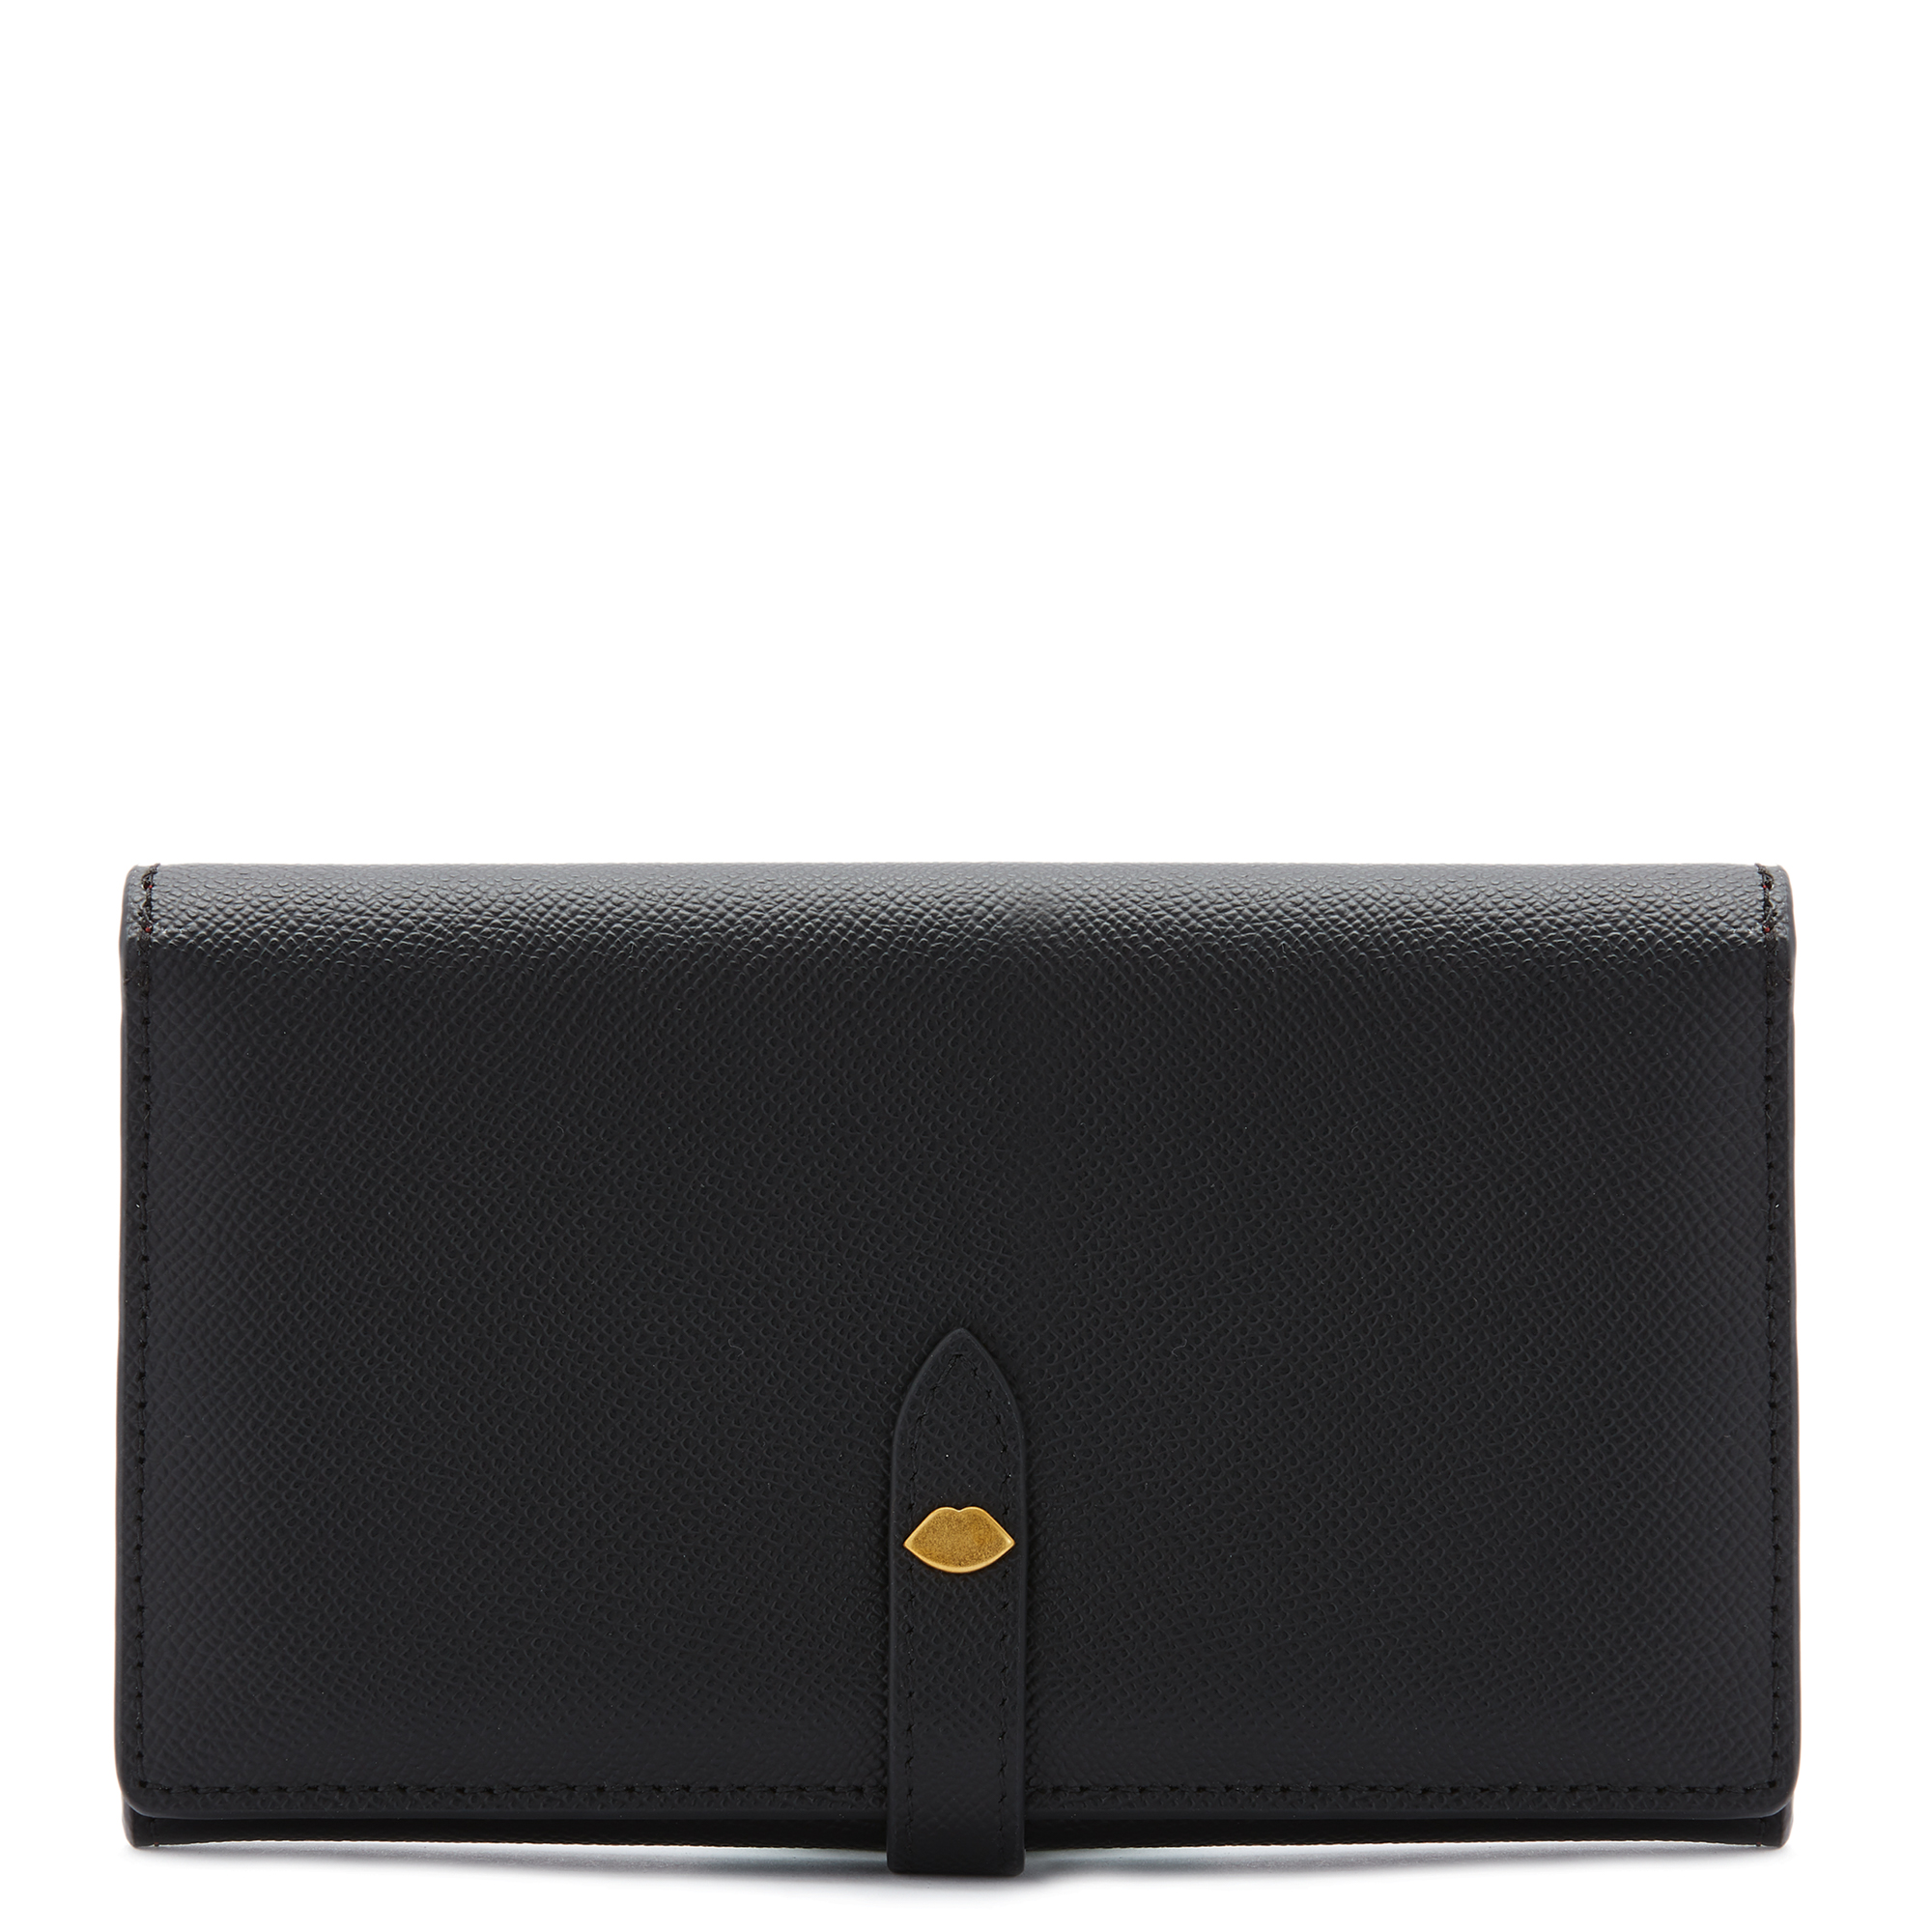 Black Leather Lip Pin Juno Wallet